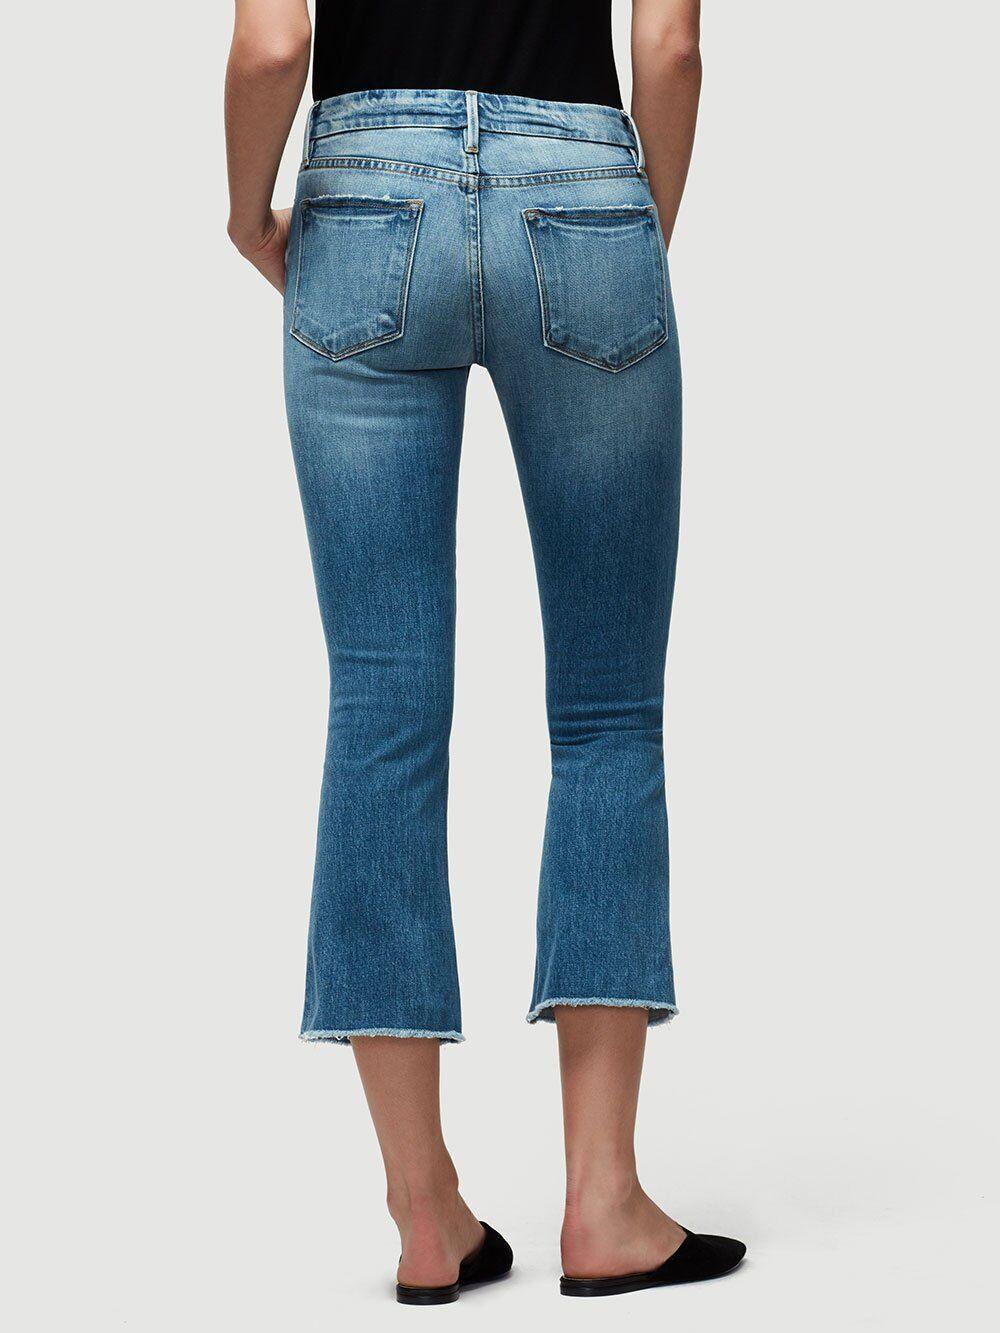 Frame Denim Femme Le Cropped Mini démarrage Cut Jeans Oppen Raw Edge Ourlet Taille 24